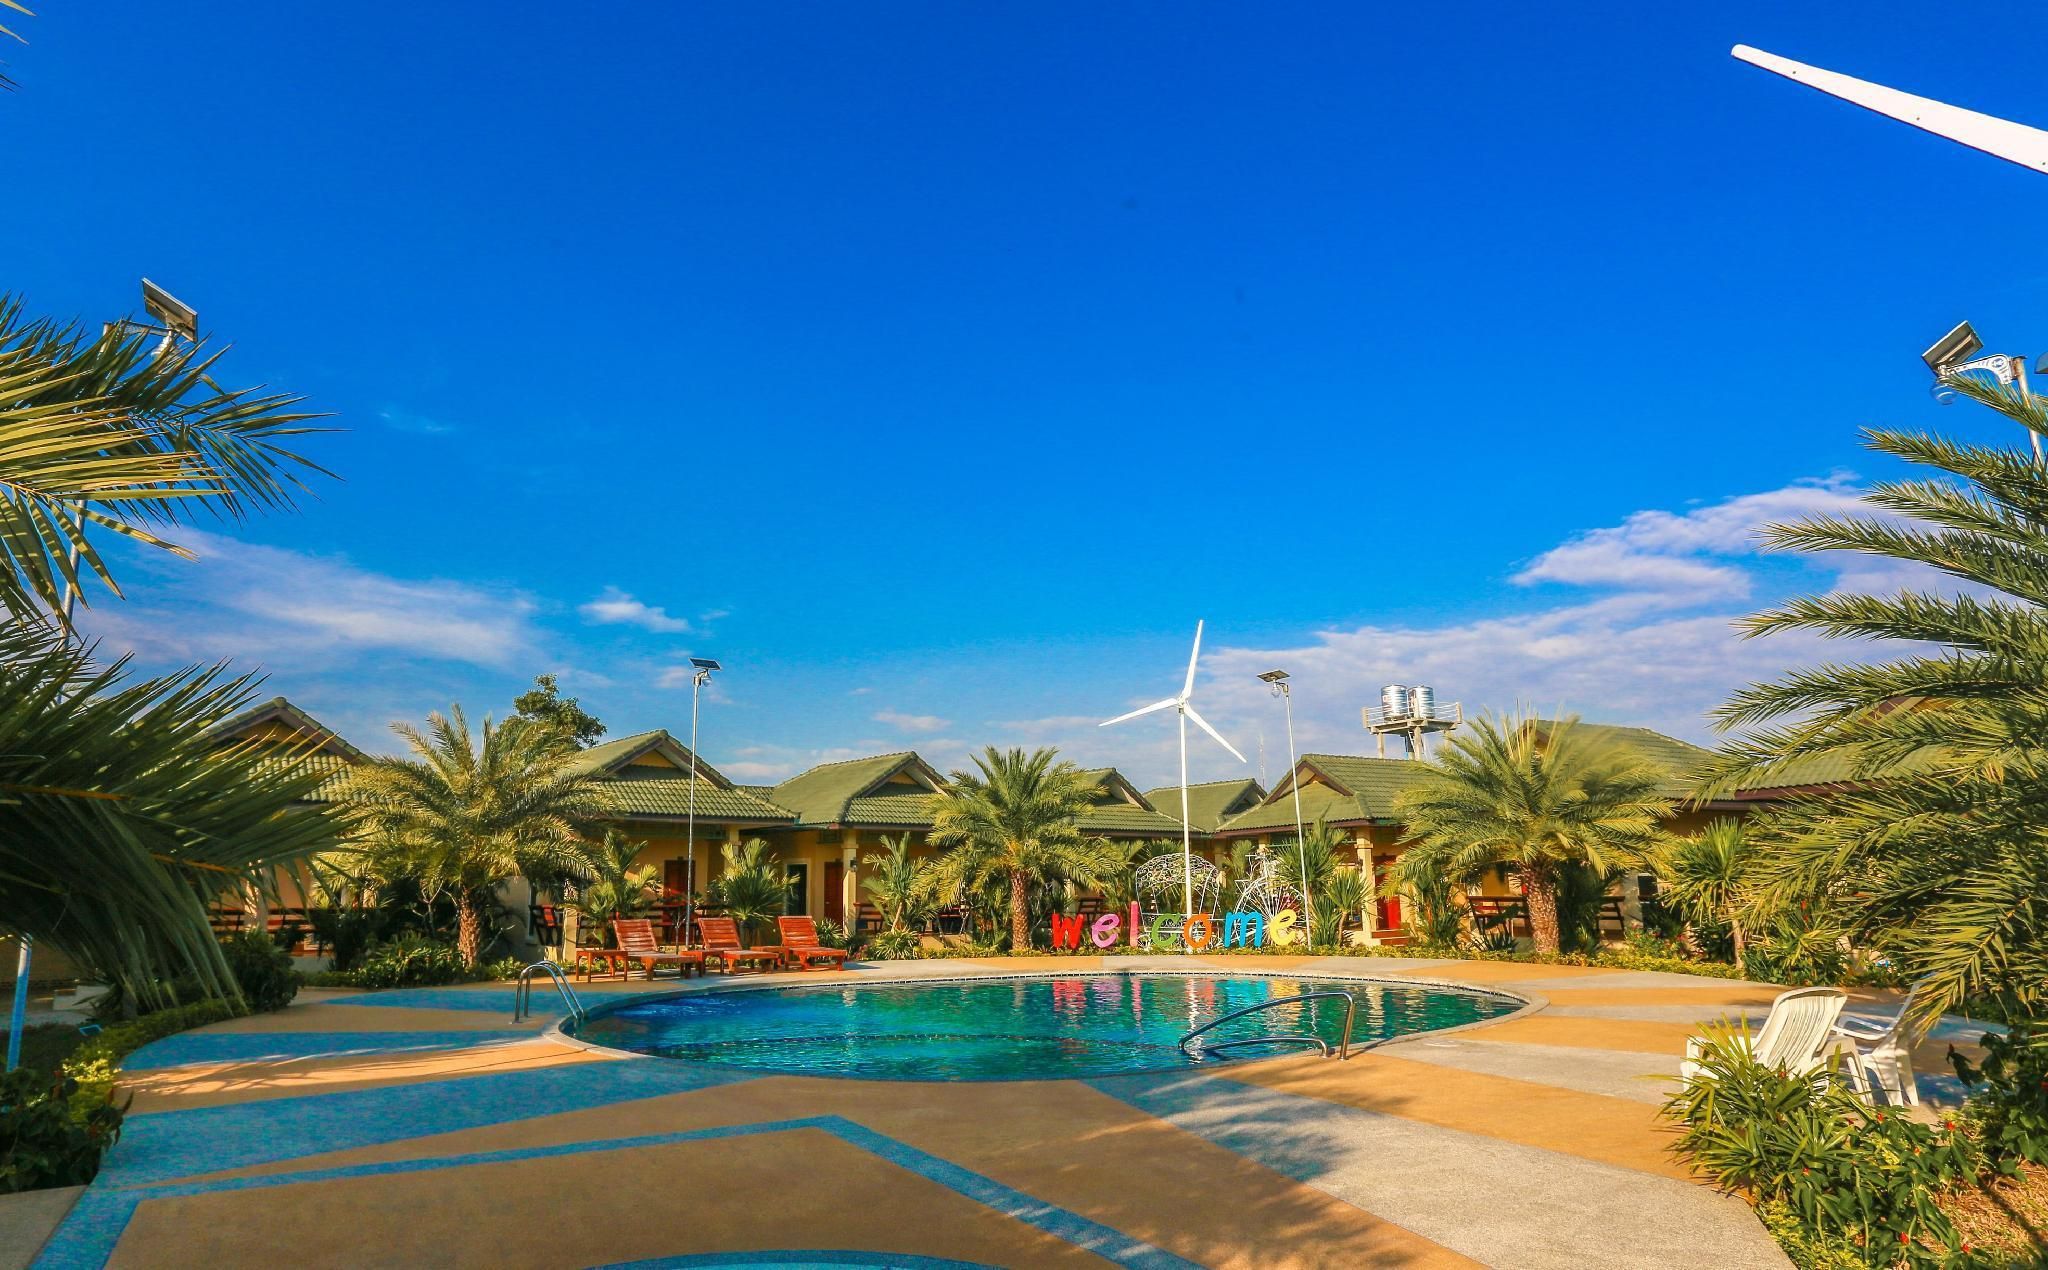 Huan Soontaree Resort เฮือนสุนทรี รีสอร์ท